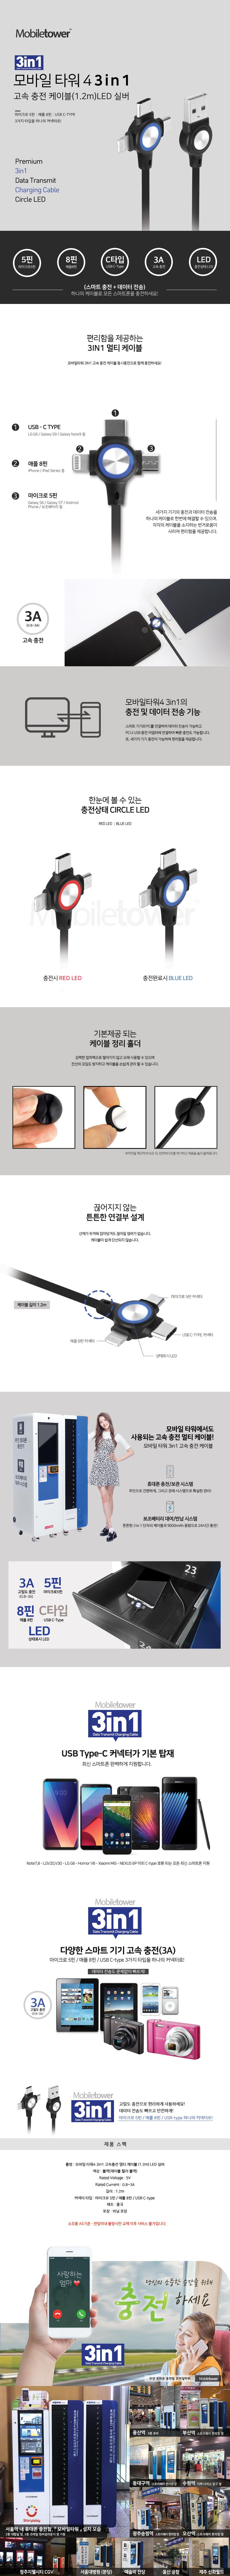 ABKO 모바일 타워4 3in1 LED 고속충전 케이블 (1.2m)